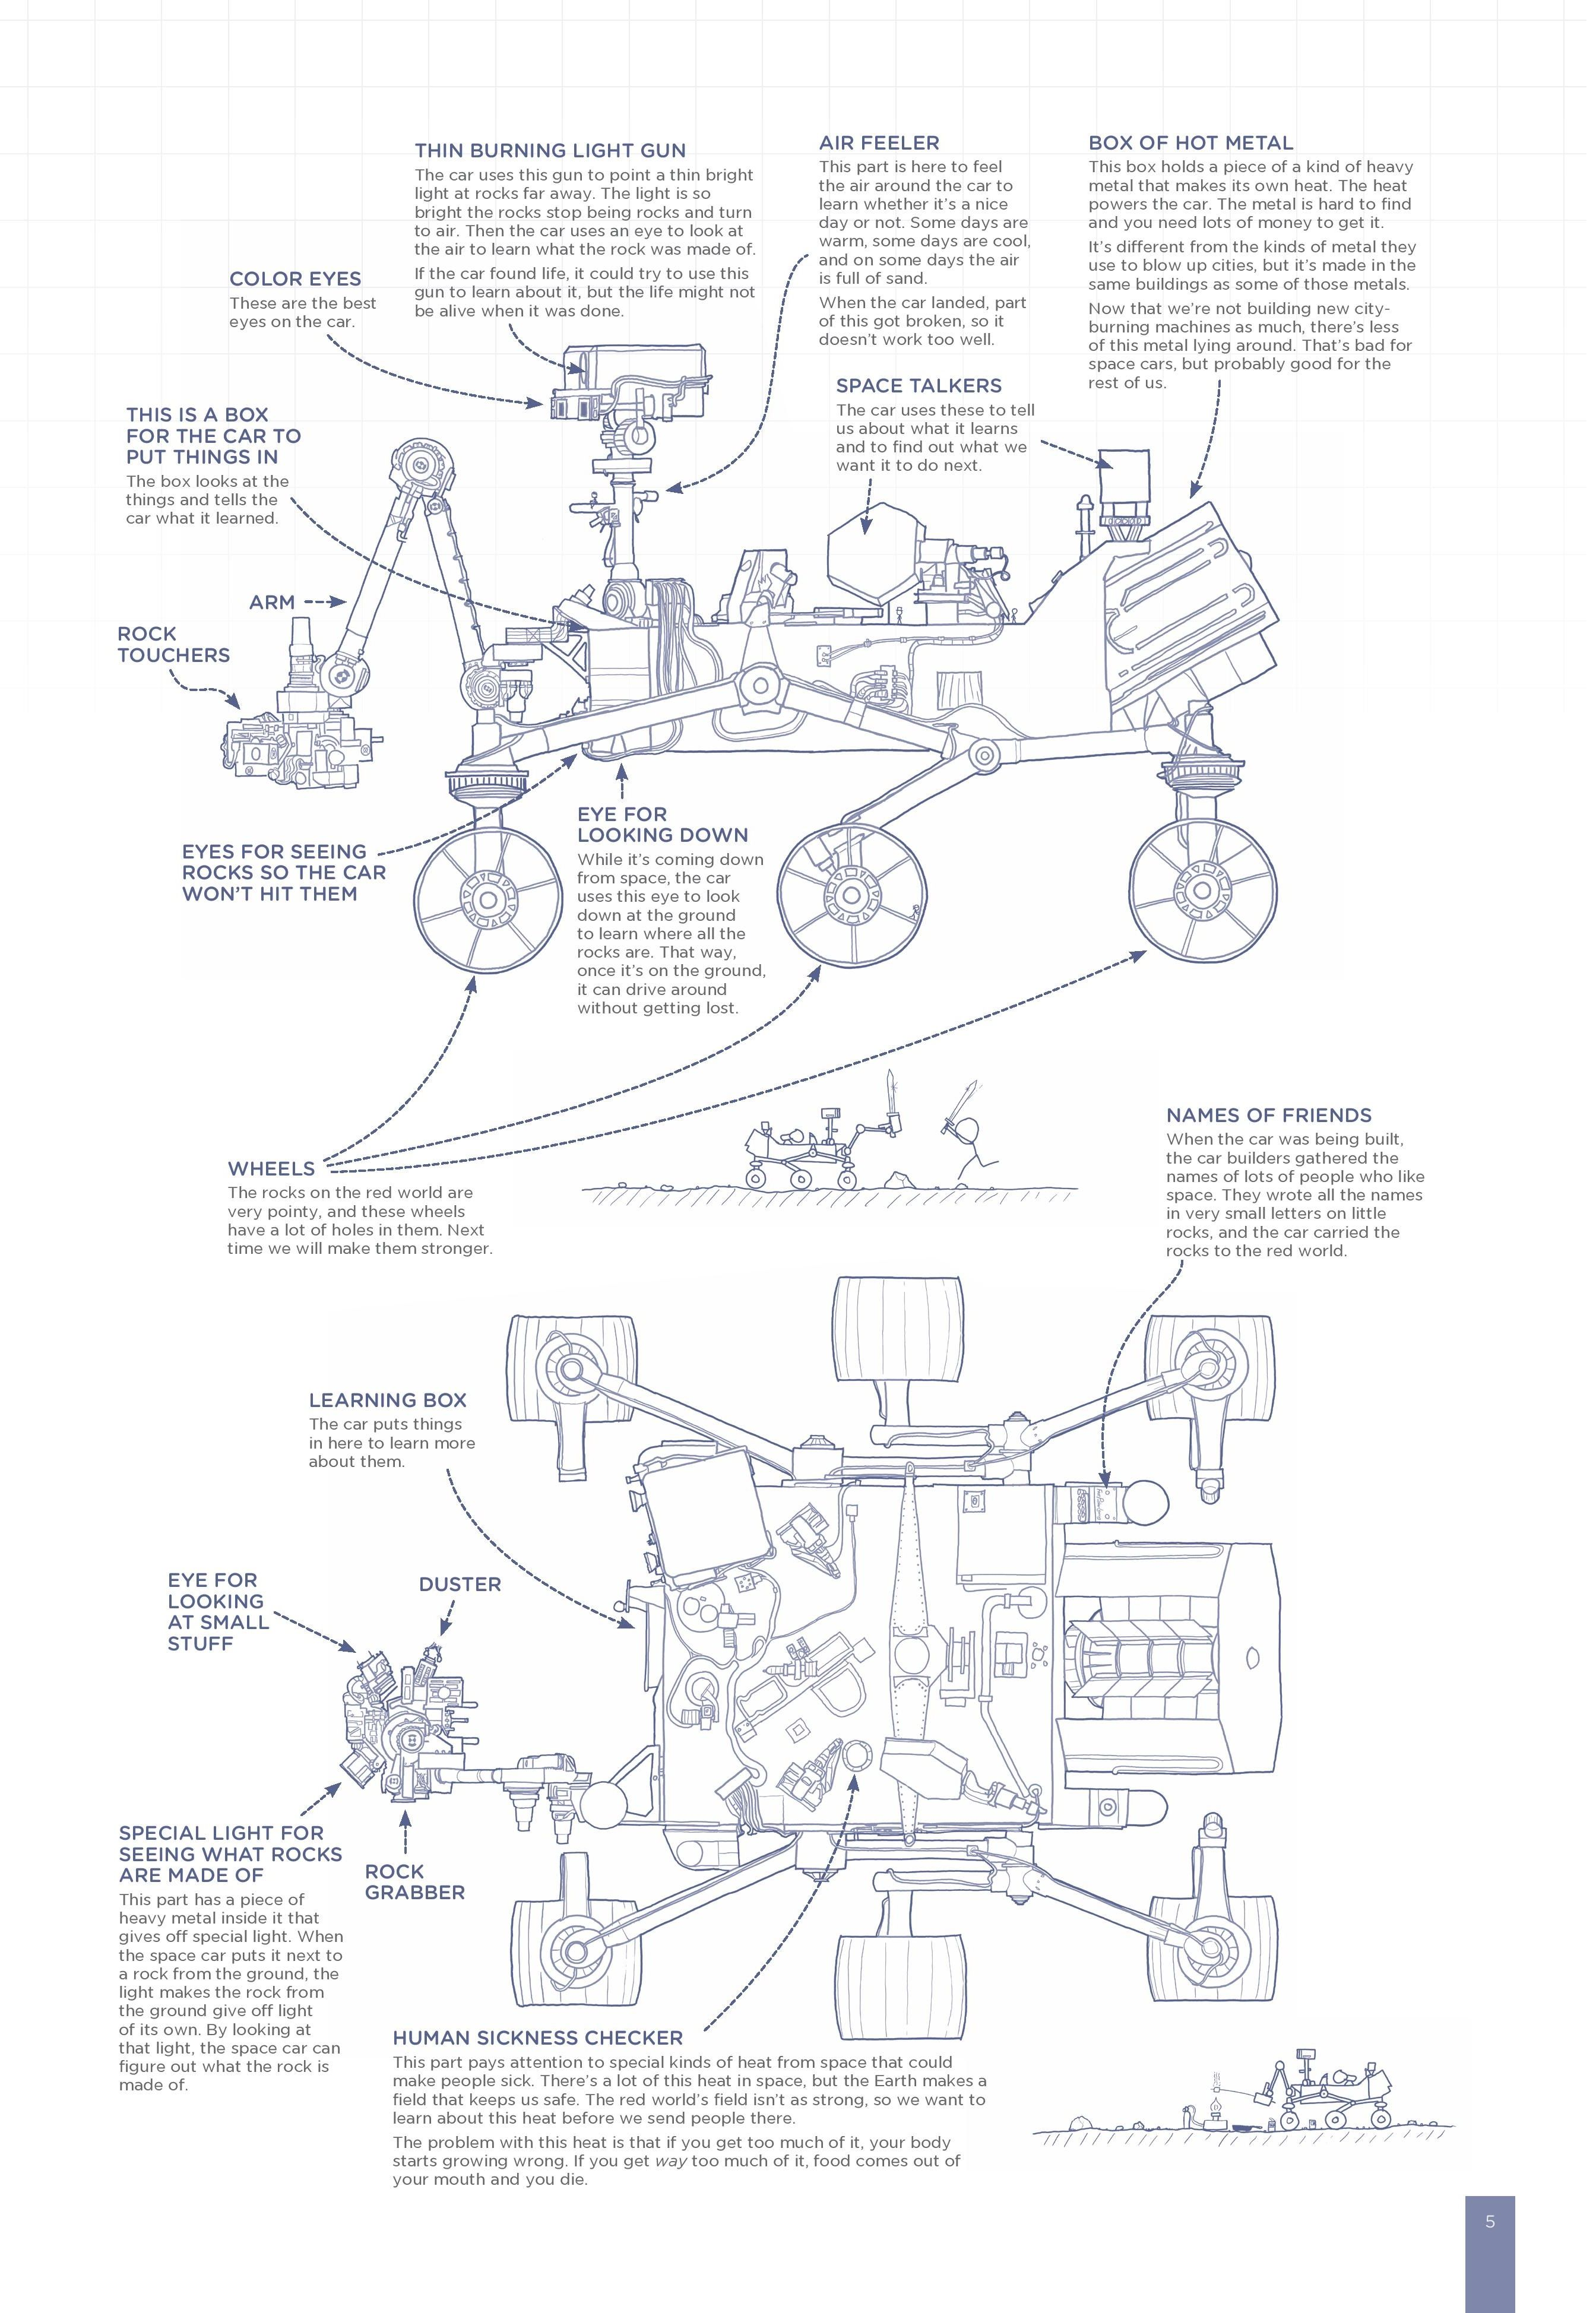 Clever Illustrations Dub NASA's Mars Rover Curiosity a